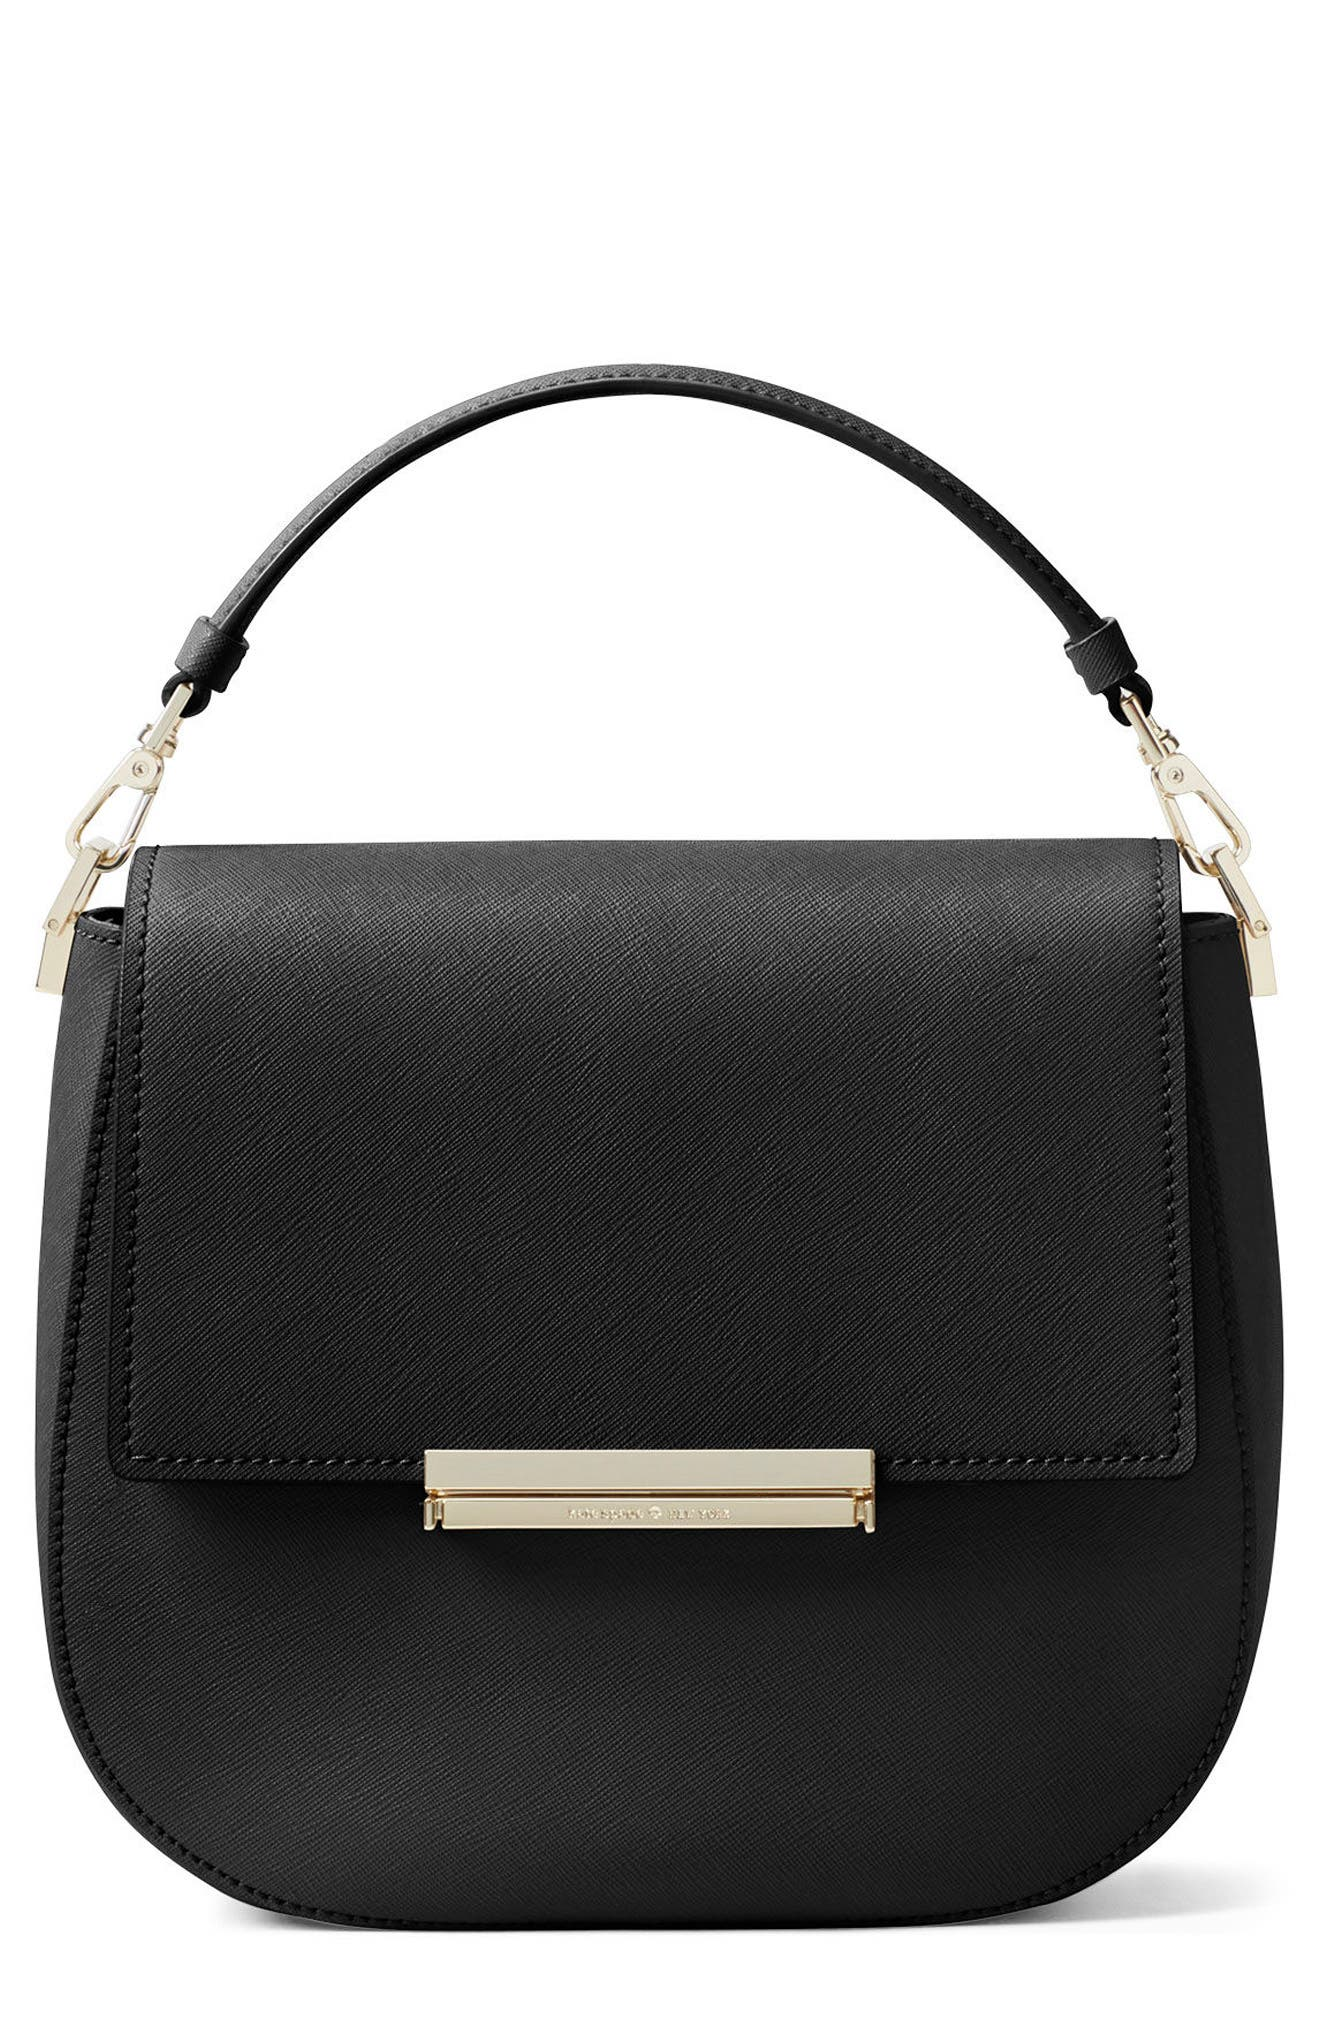 make it mine - byrdie leather saddle bag,                             Main thumbnail 1, color,                             Black